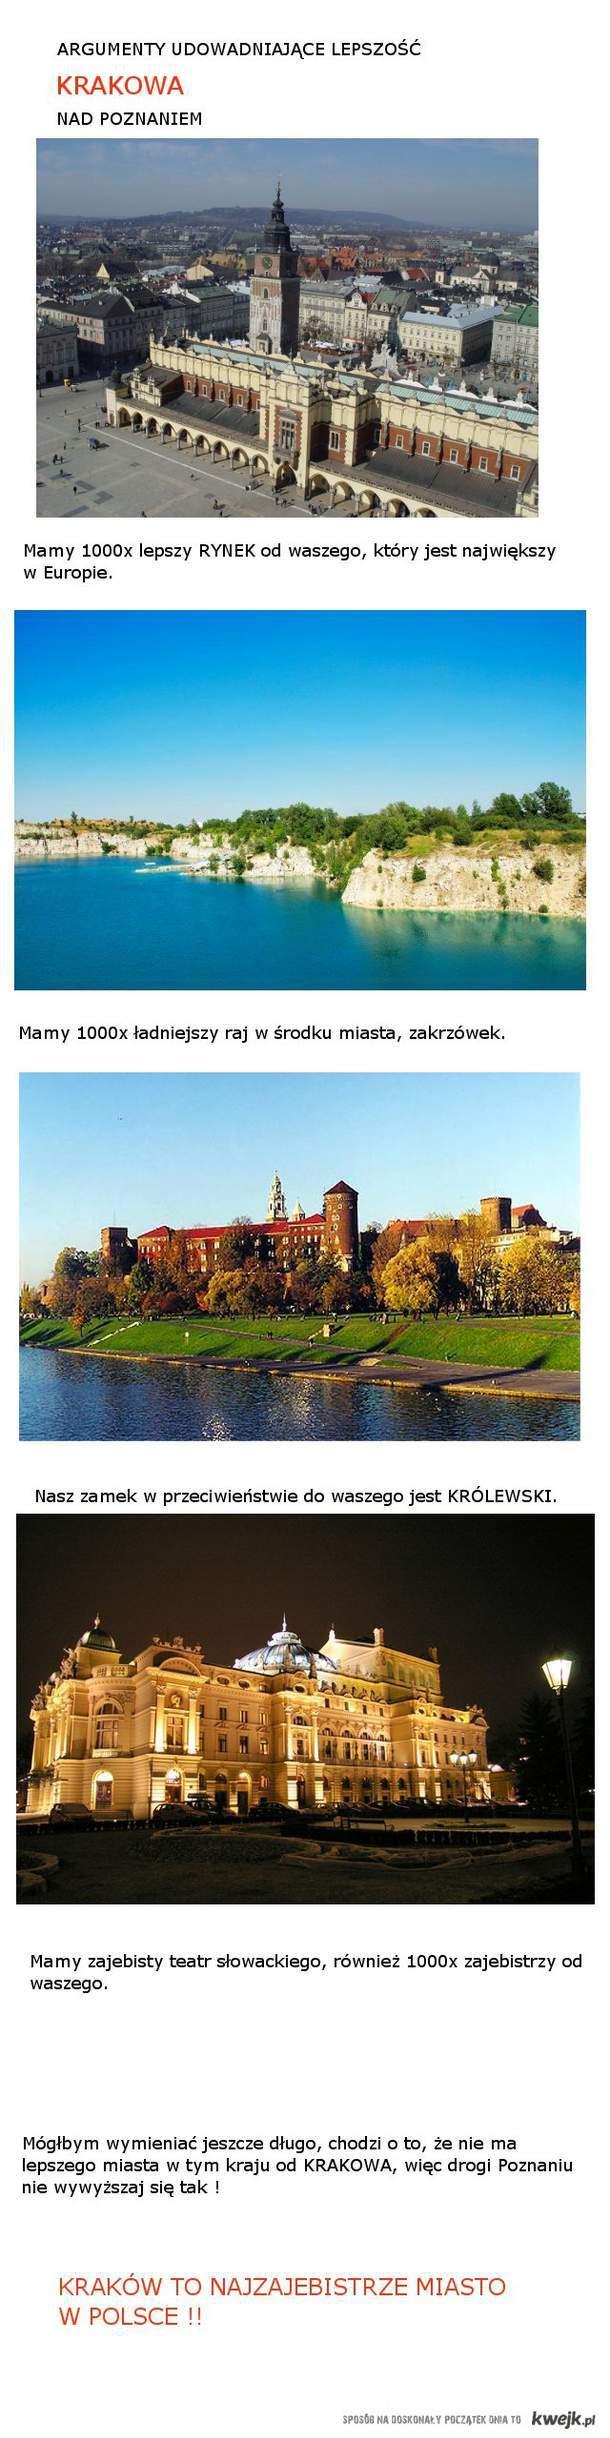 Kraków rlz.